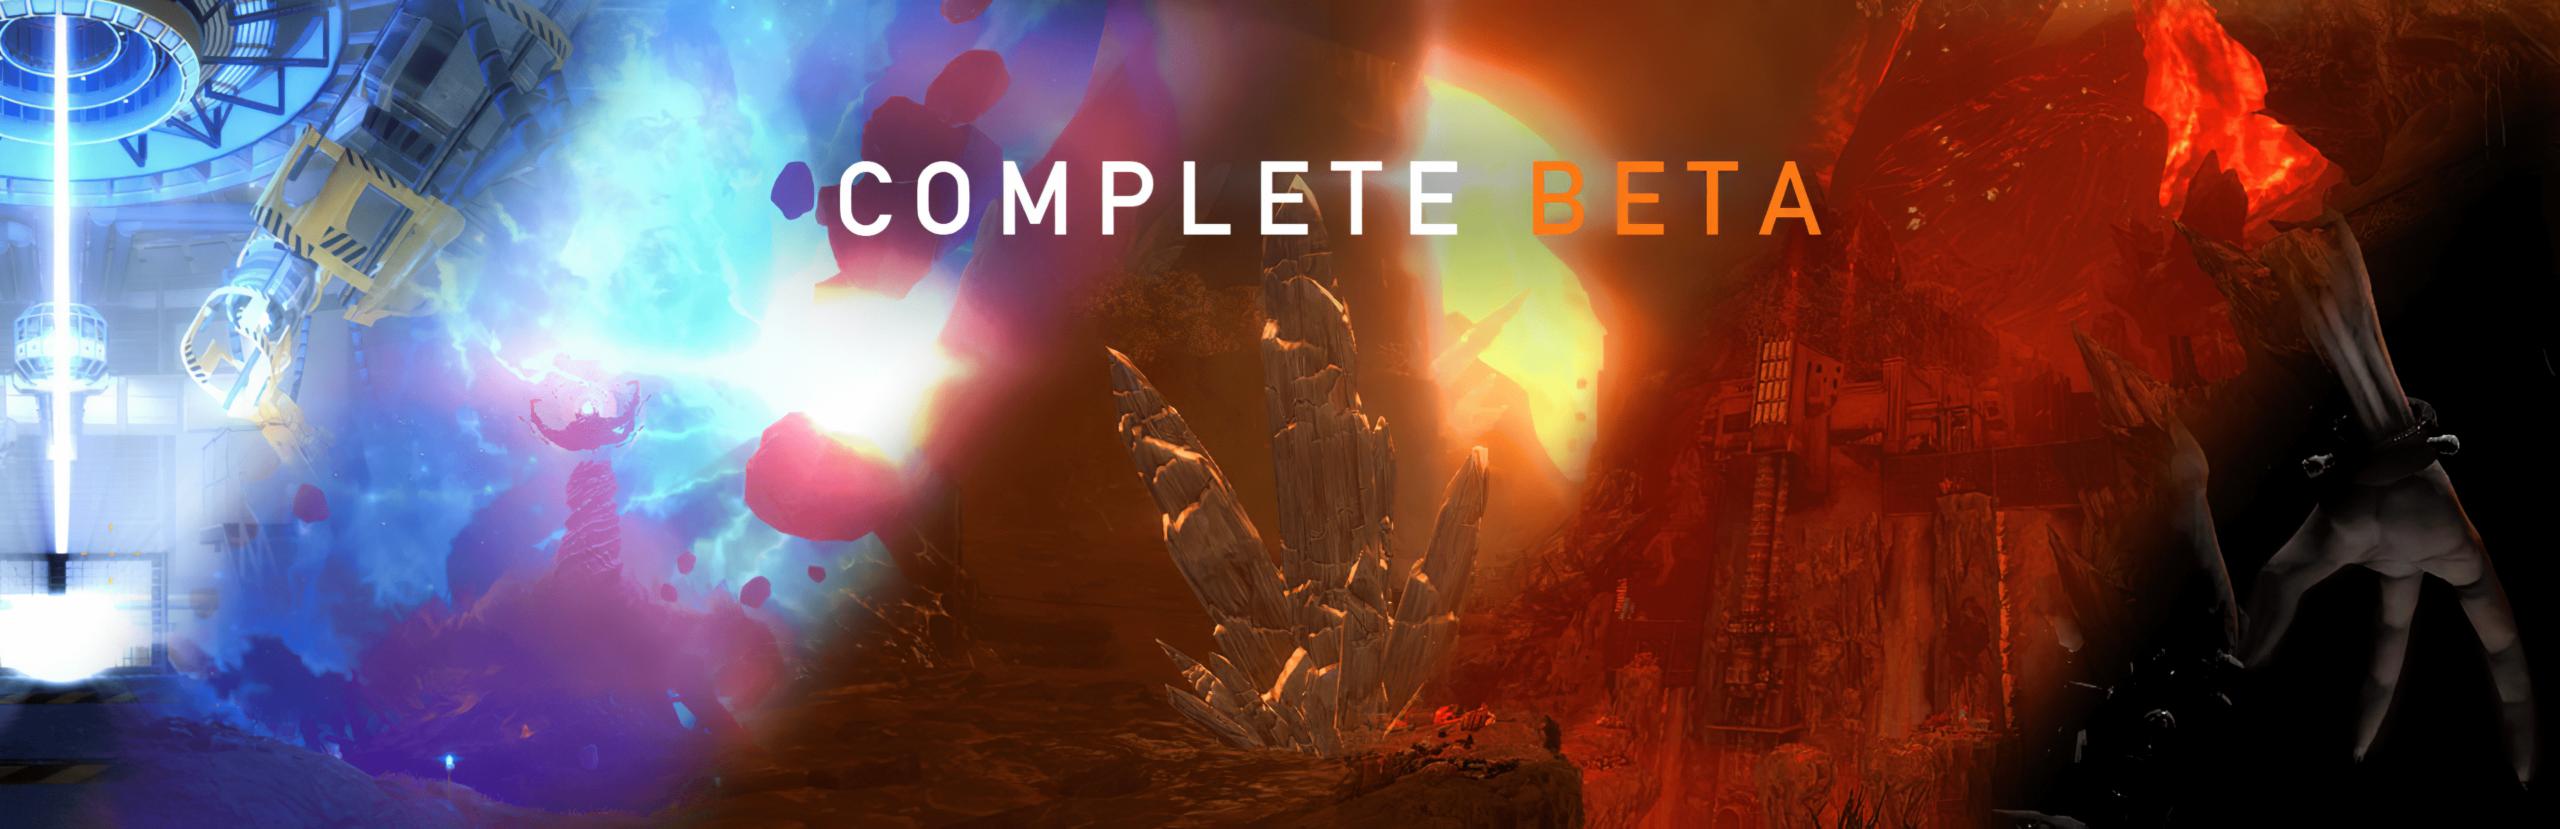 Black Mesa - Complete Beta